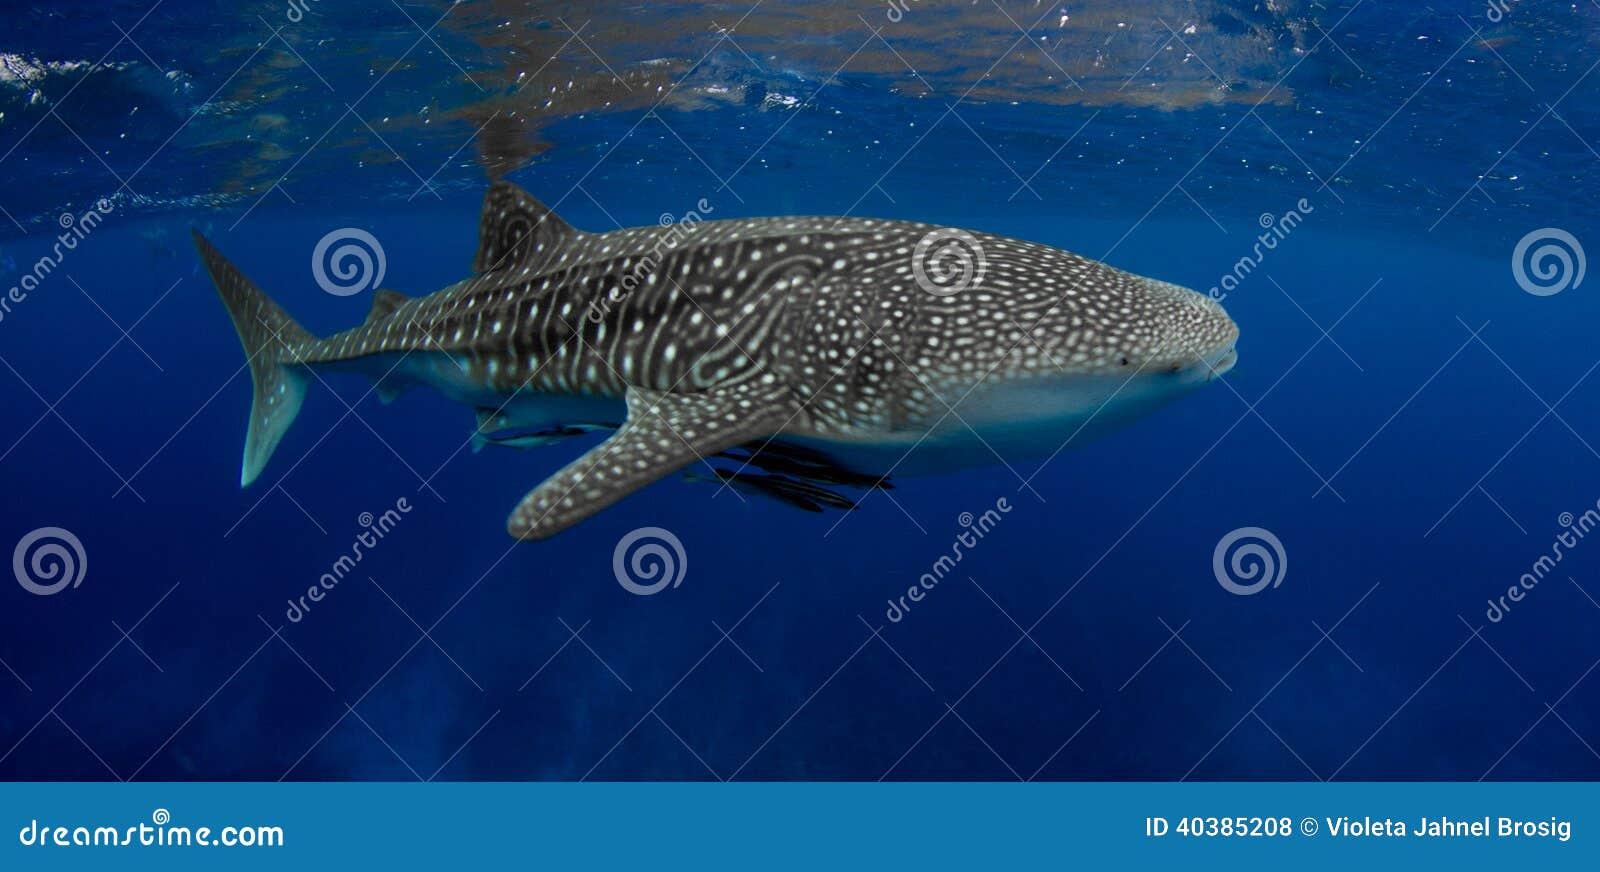 Best whale shark ever